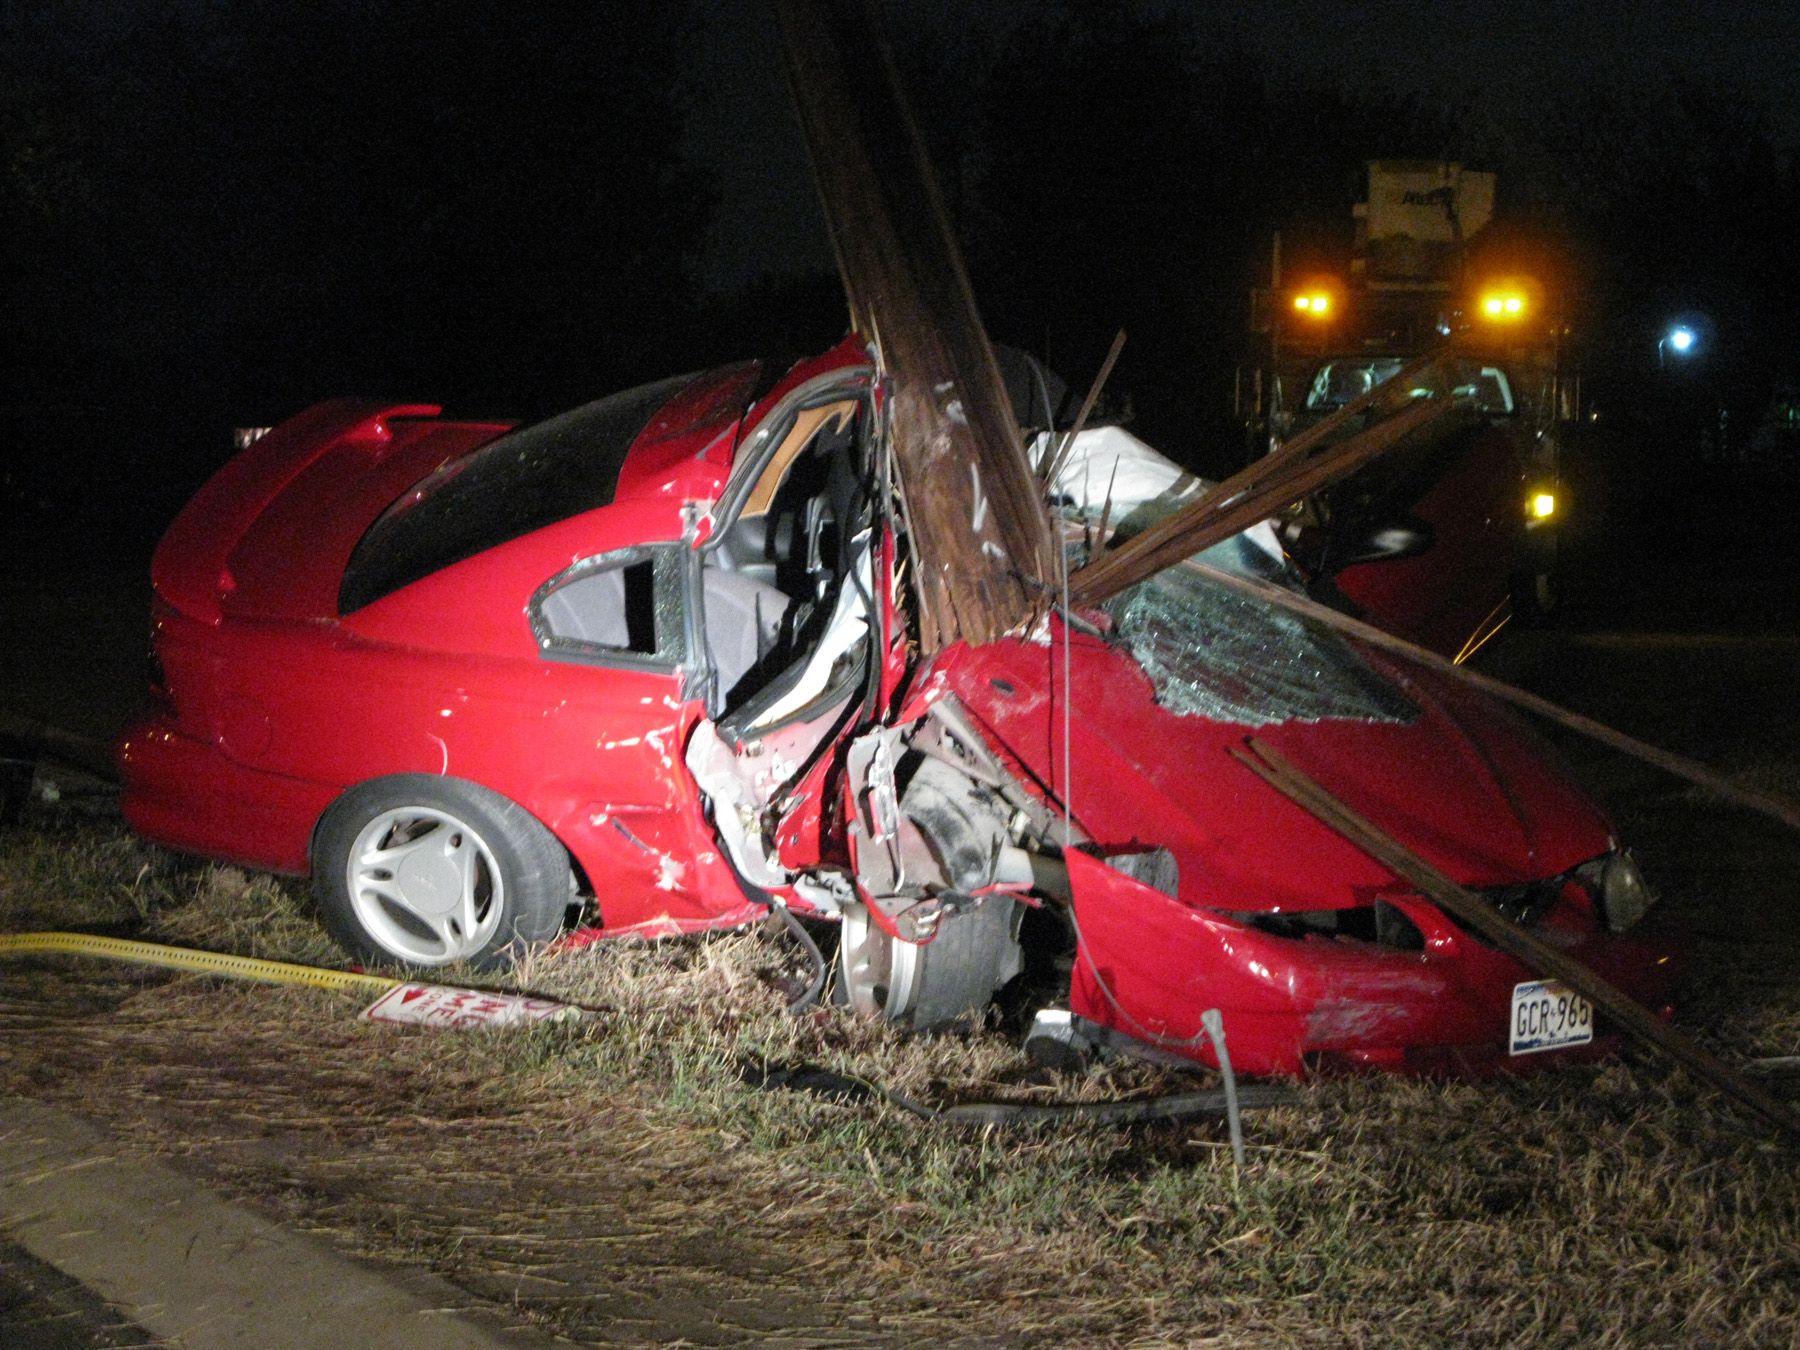 car crash victims gif cartoon meme pictures at night clip art drawing photos images bad